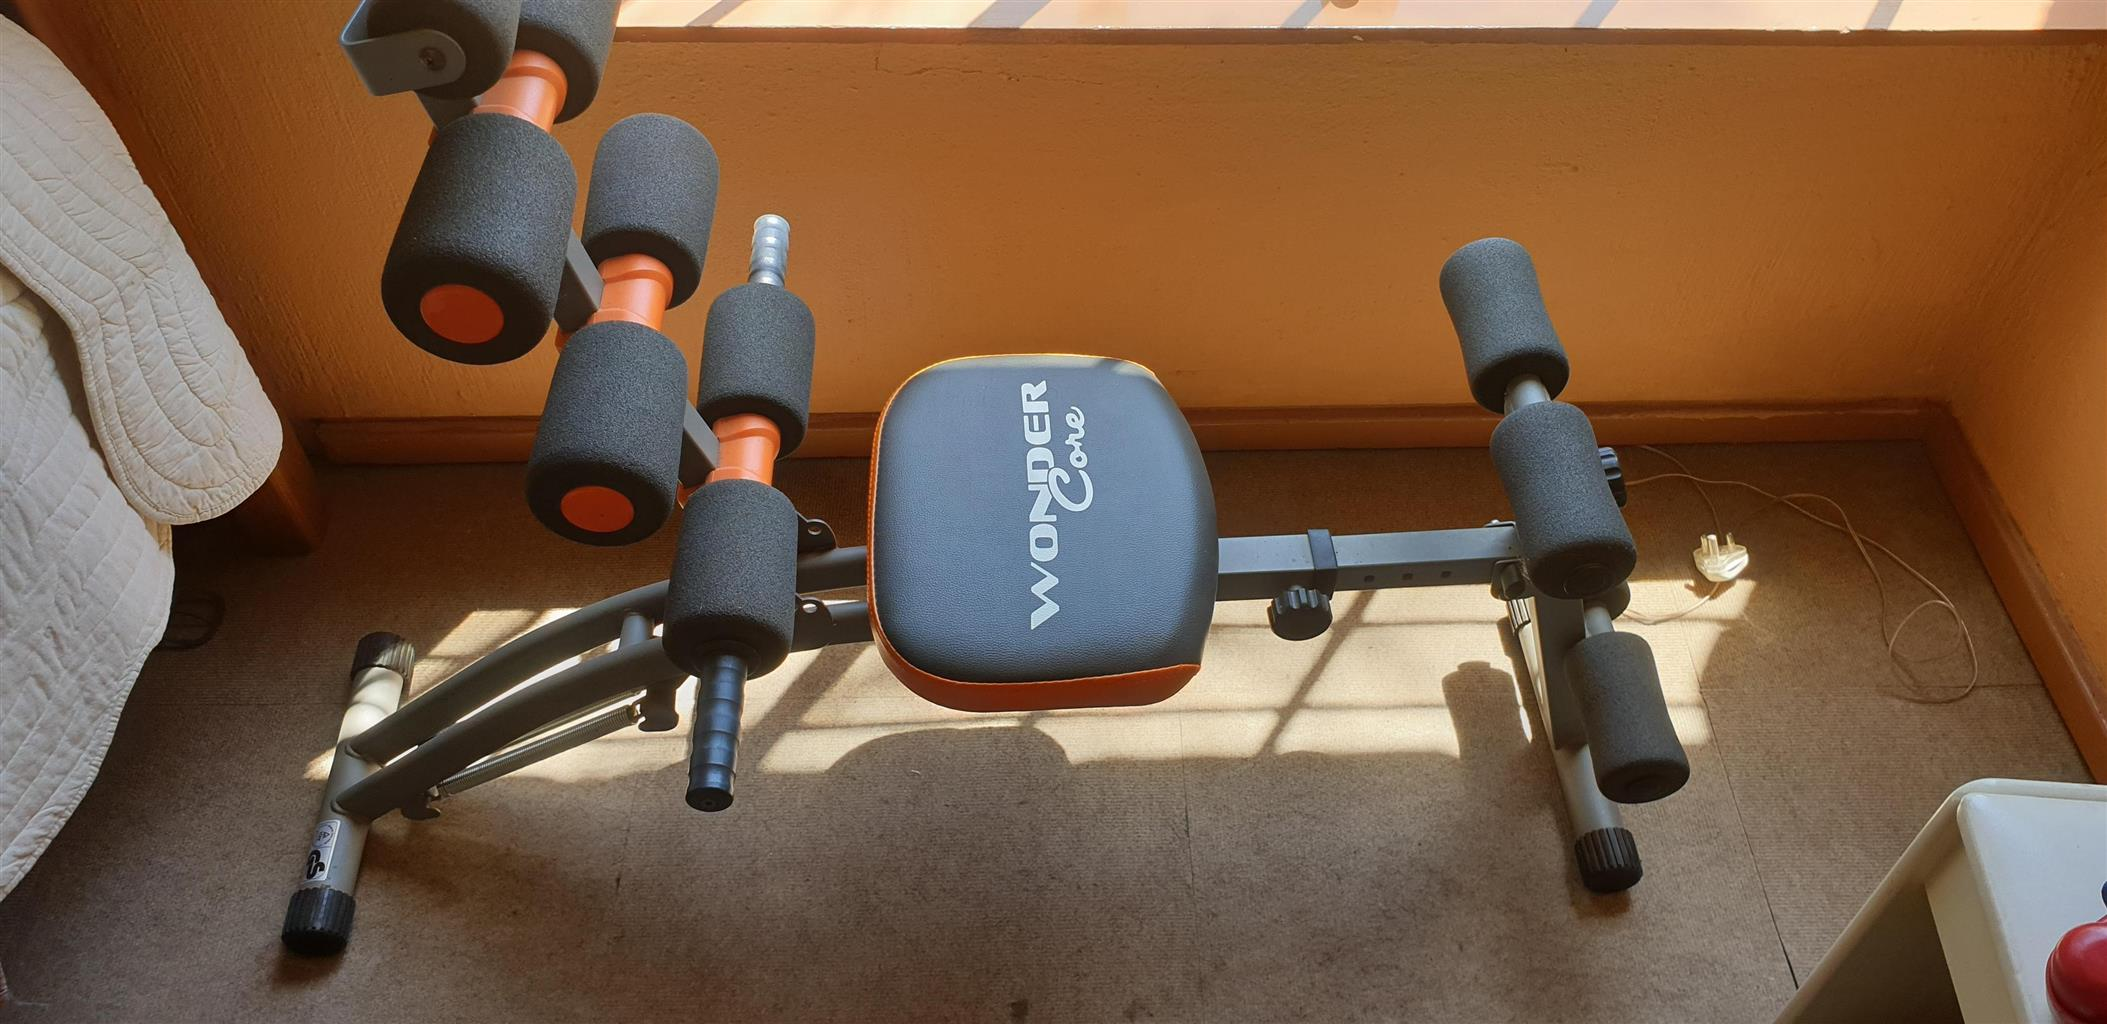 Home excercise equipment